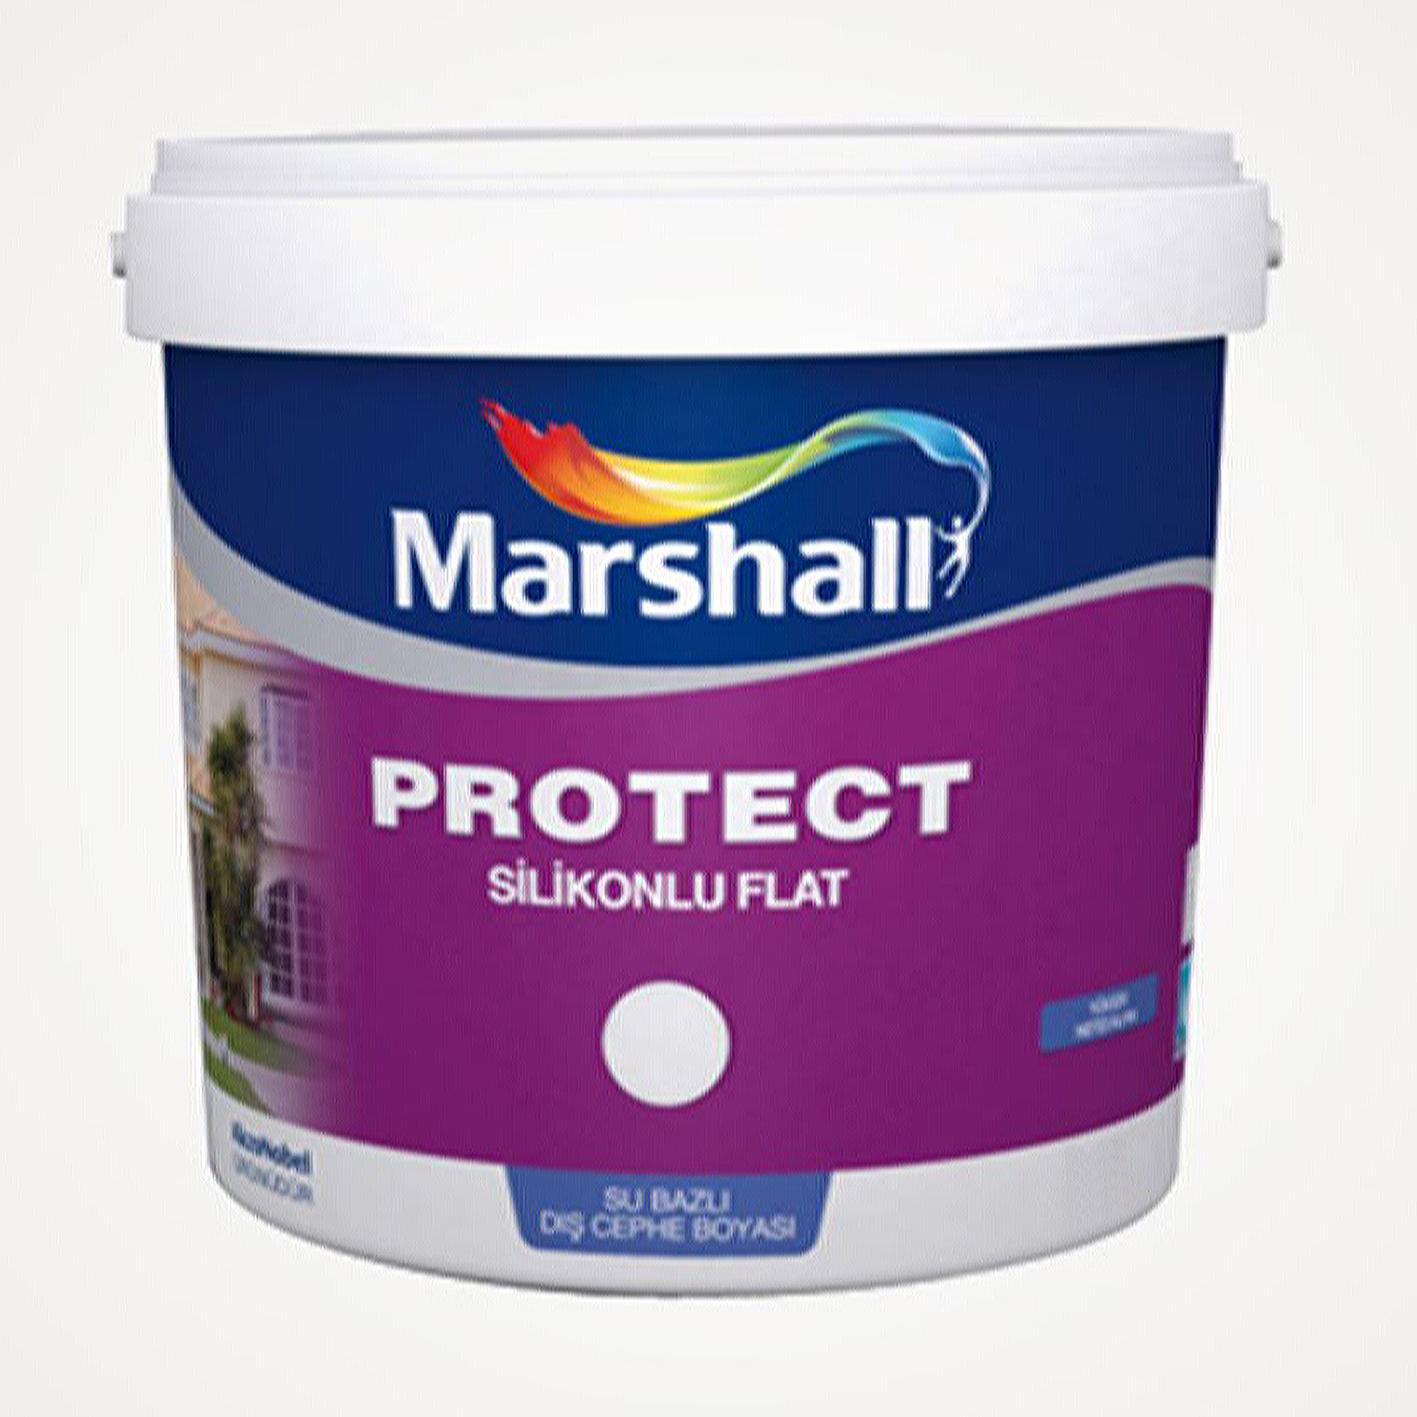 Marshall Protect Silikonlu Dış Cephe Beyaz BW 15Lt